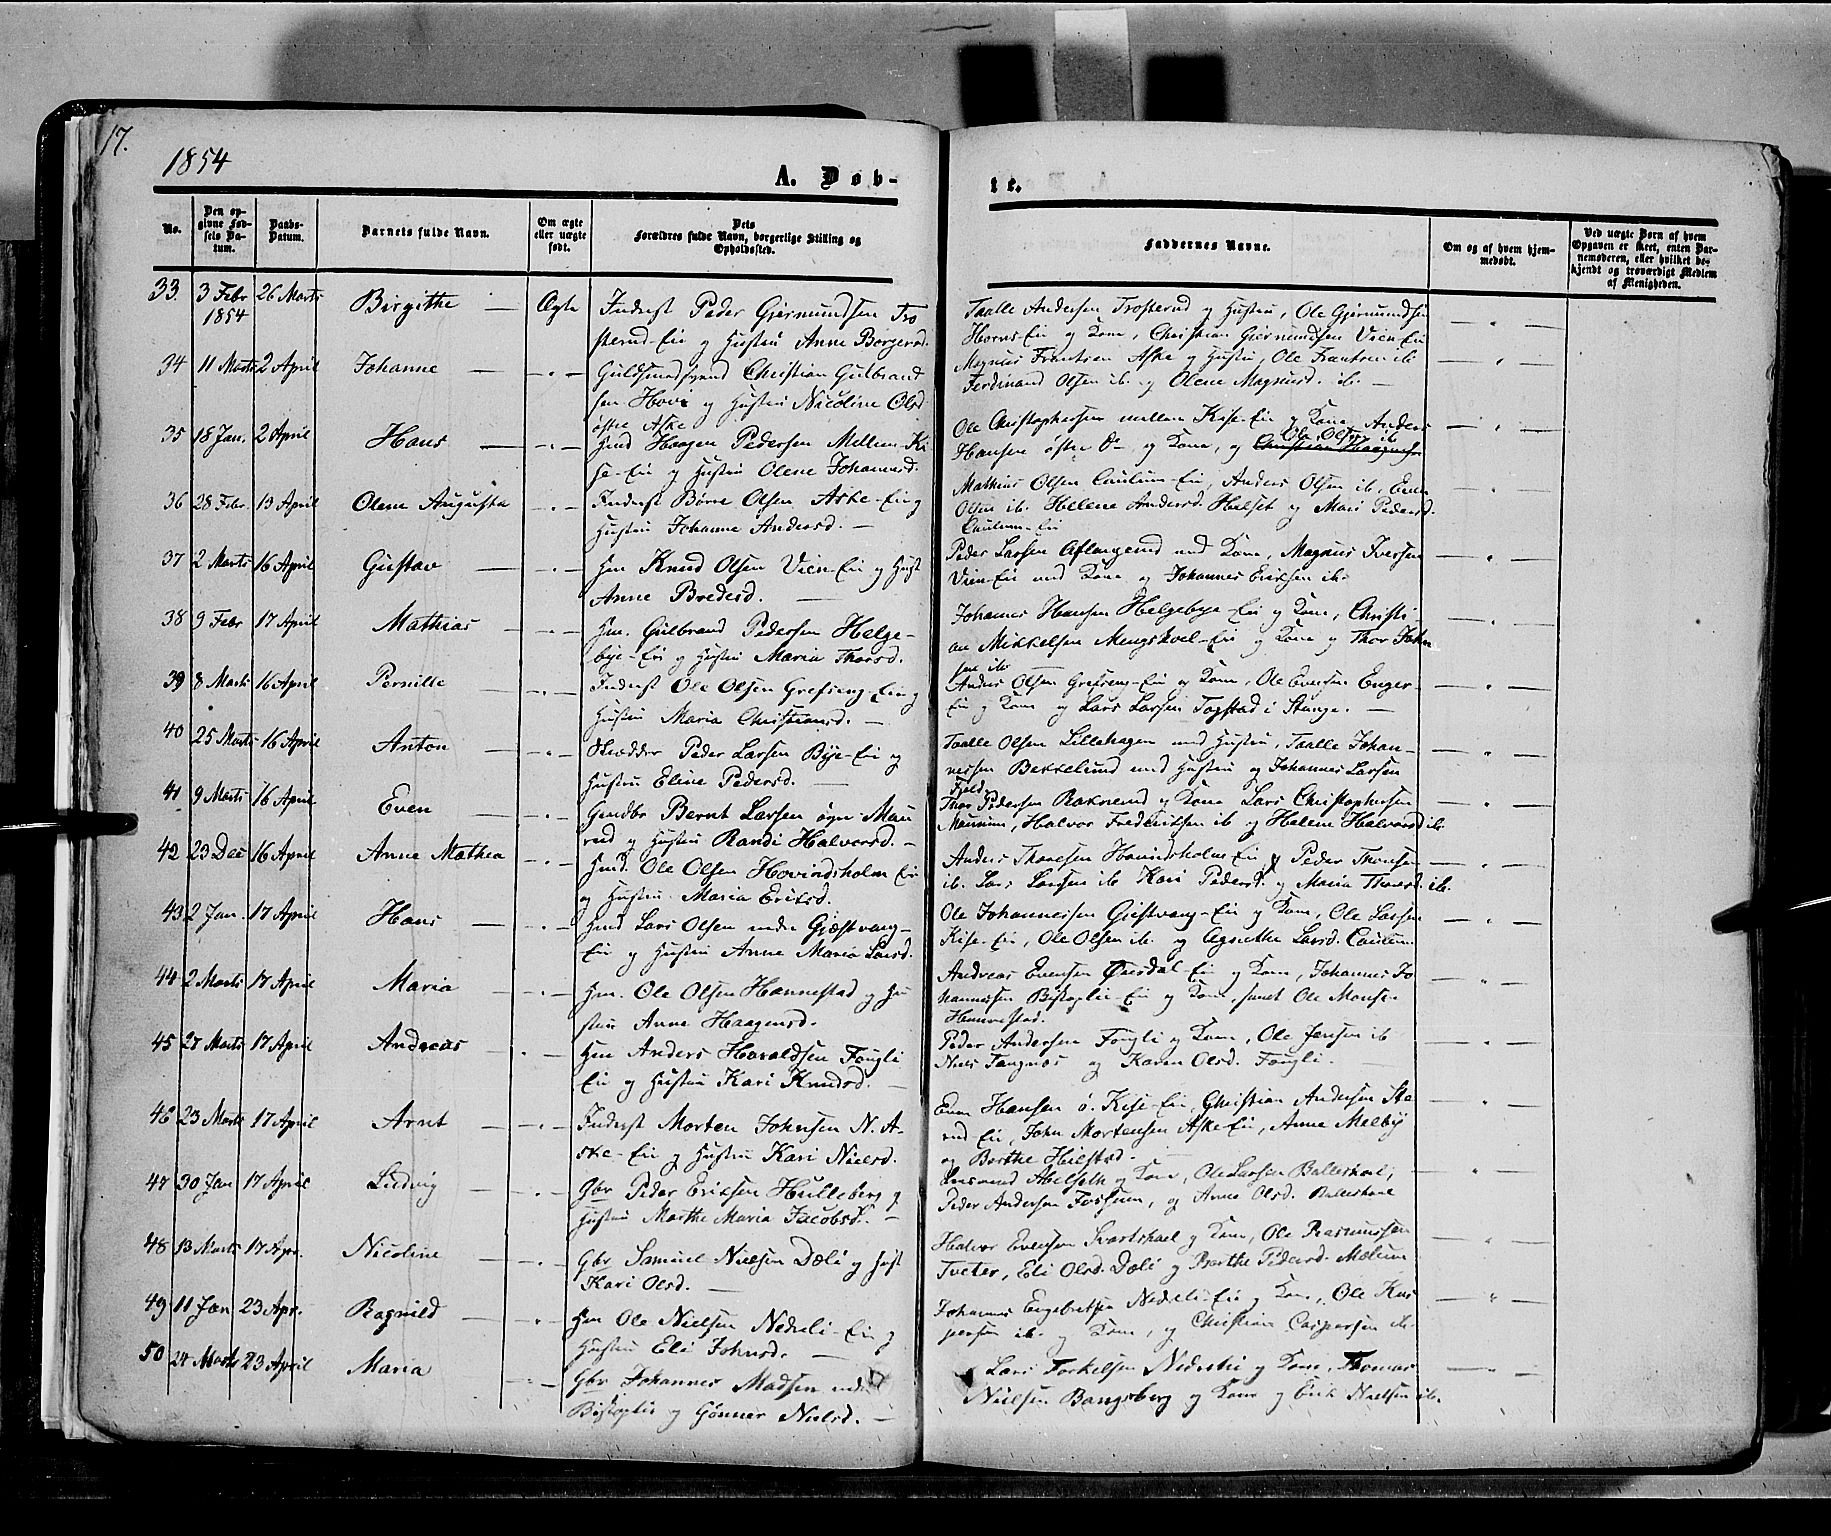 SAH, Nes prestekontor, K/Ka/L0004: Ministerialbok nr. 4, 1852-1886, s. 17